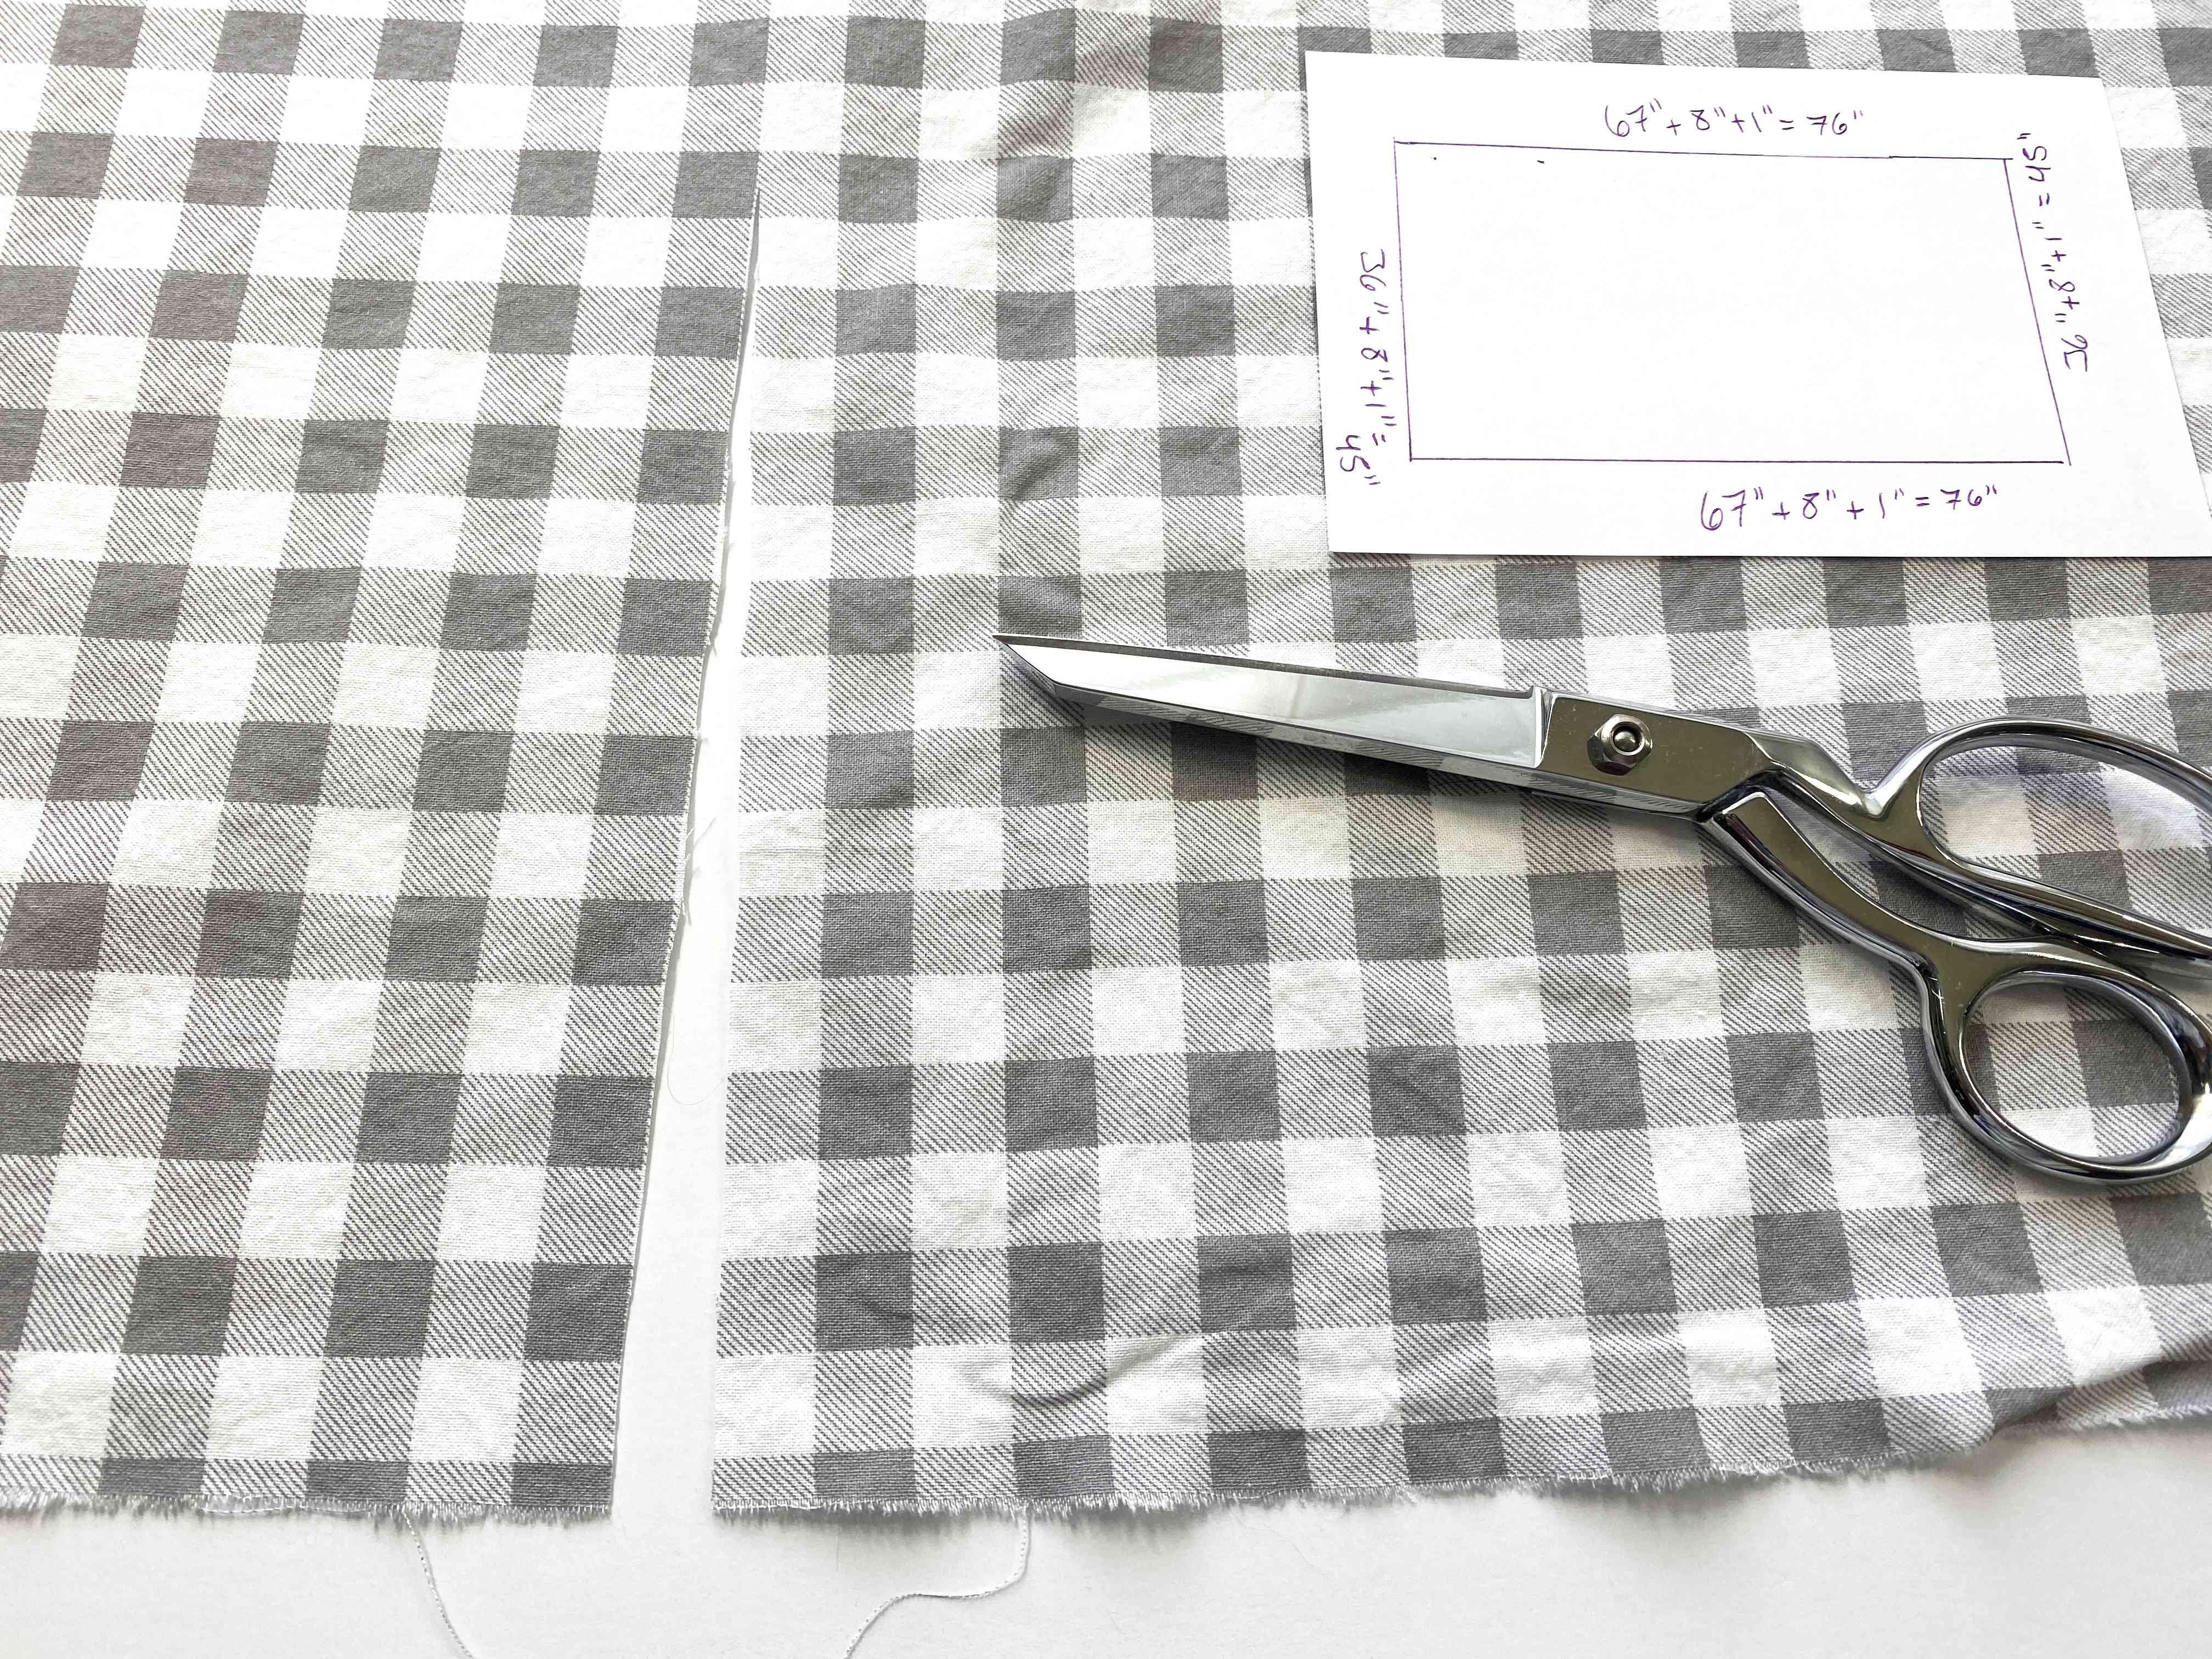 Fabric, scissors, and a diagram